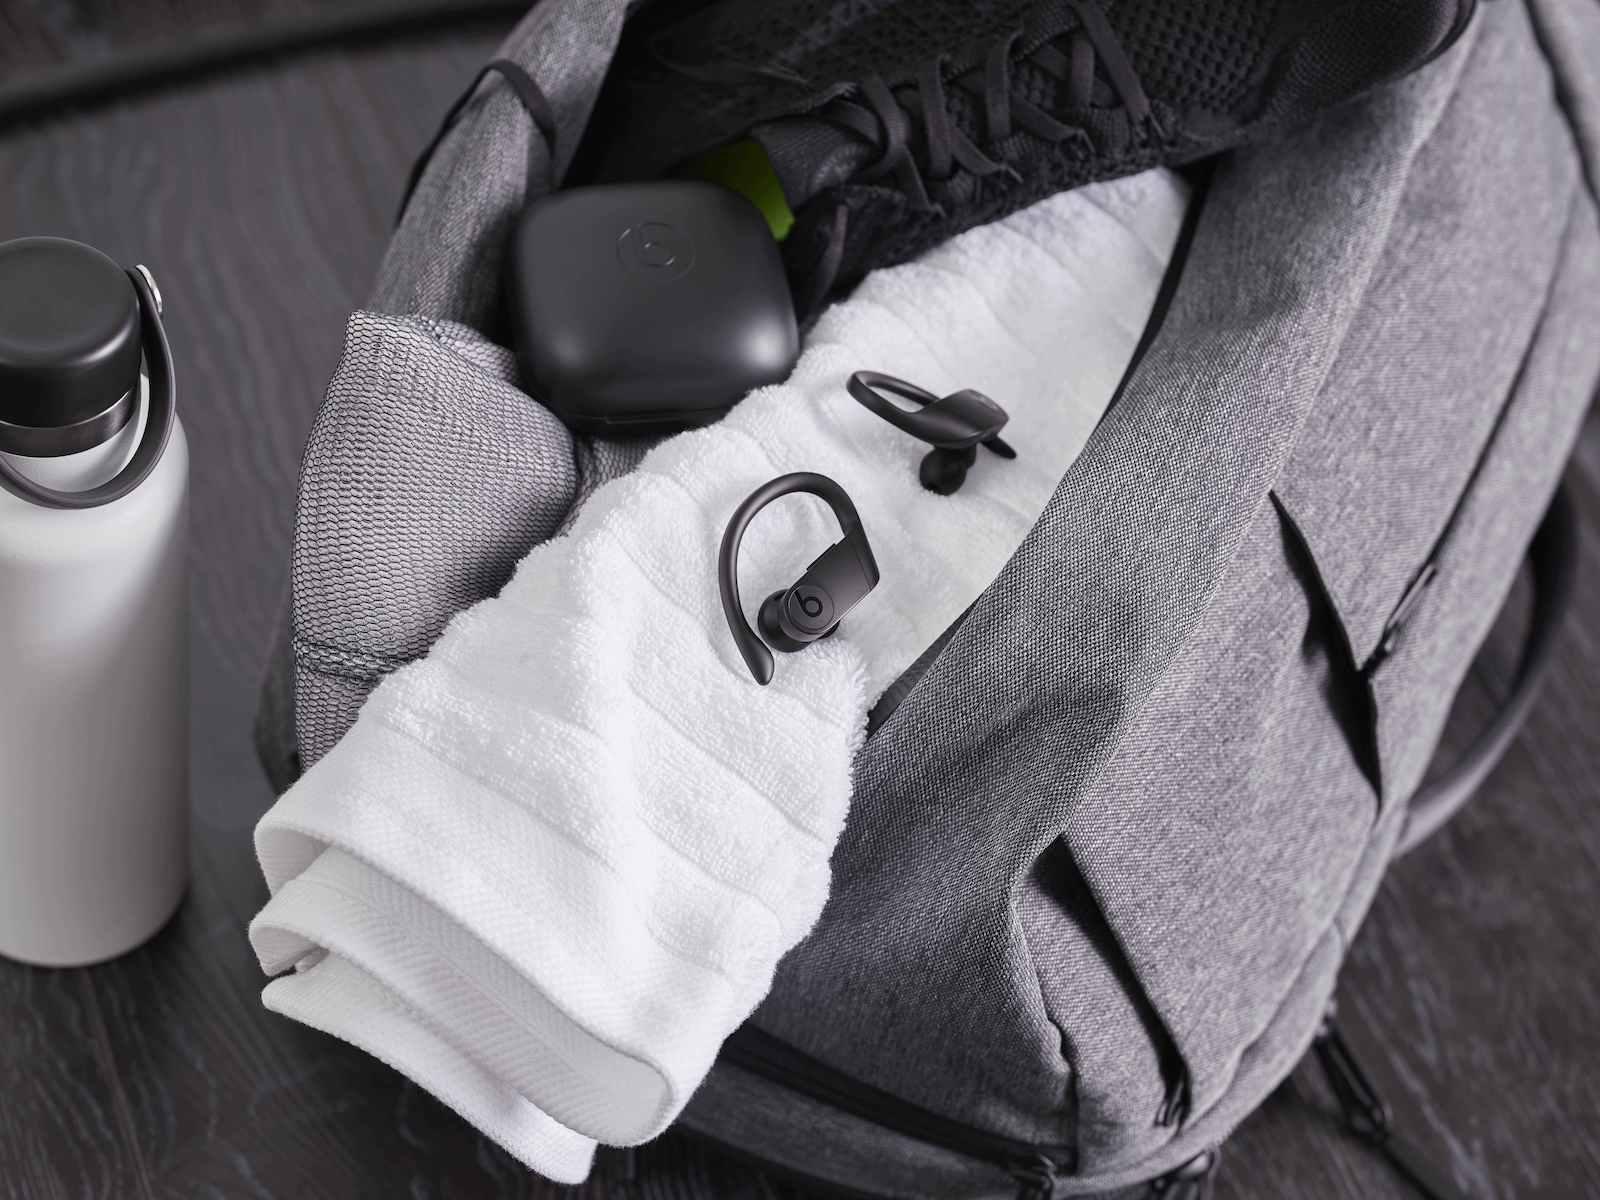 PP_Lifestyle_PBPRO_BLK_Towel_23804_R2a_RGB.jpg